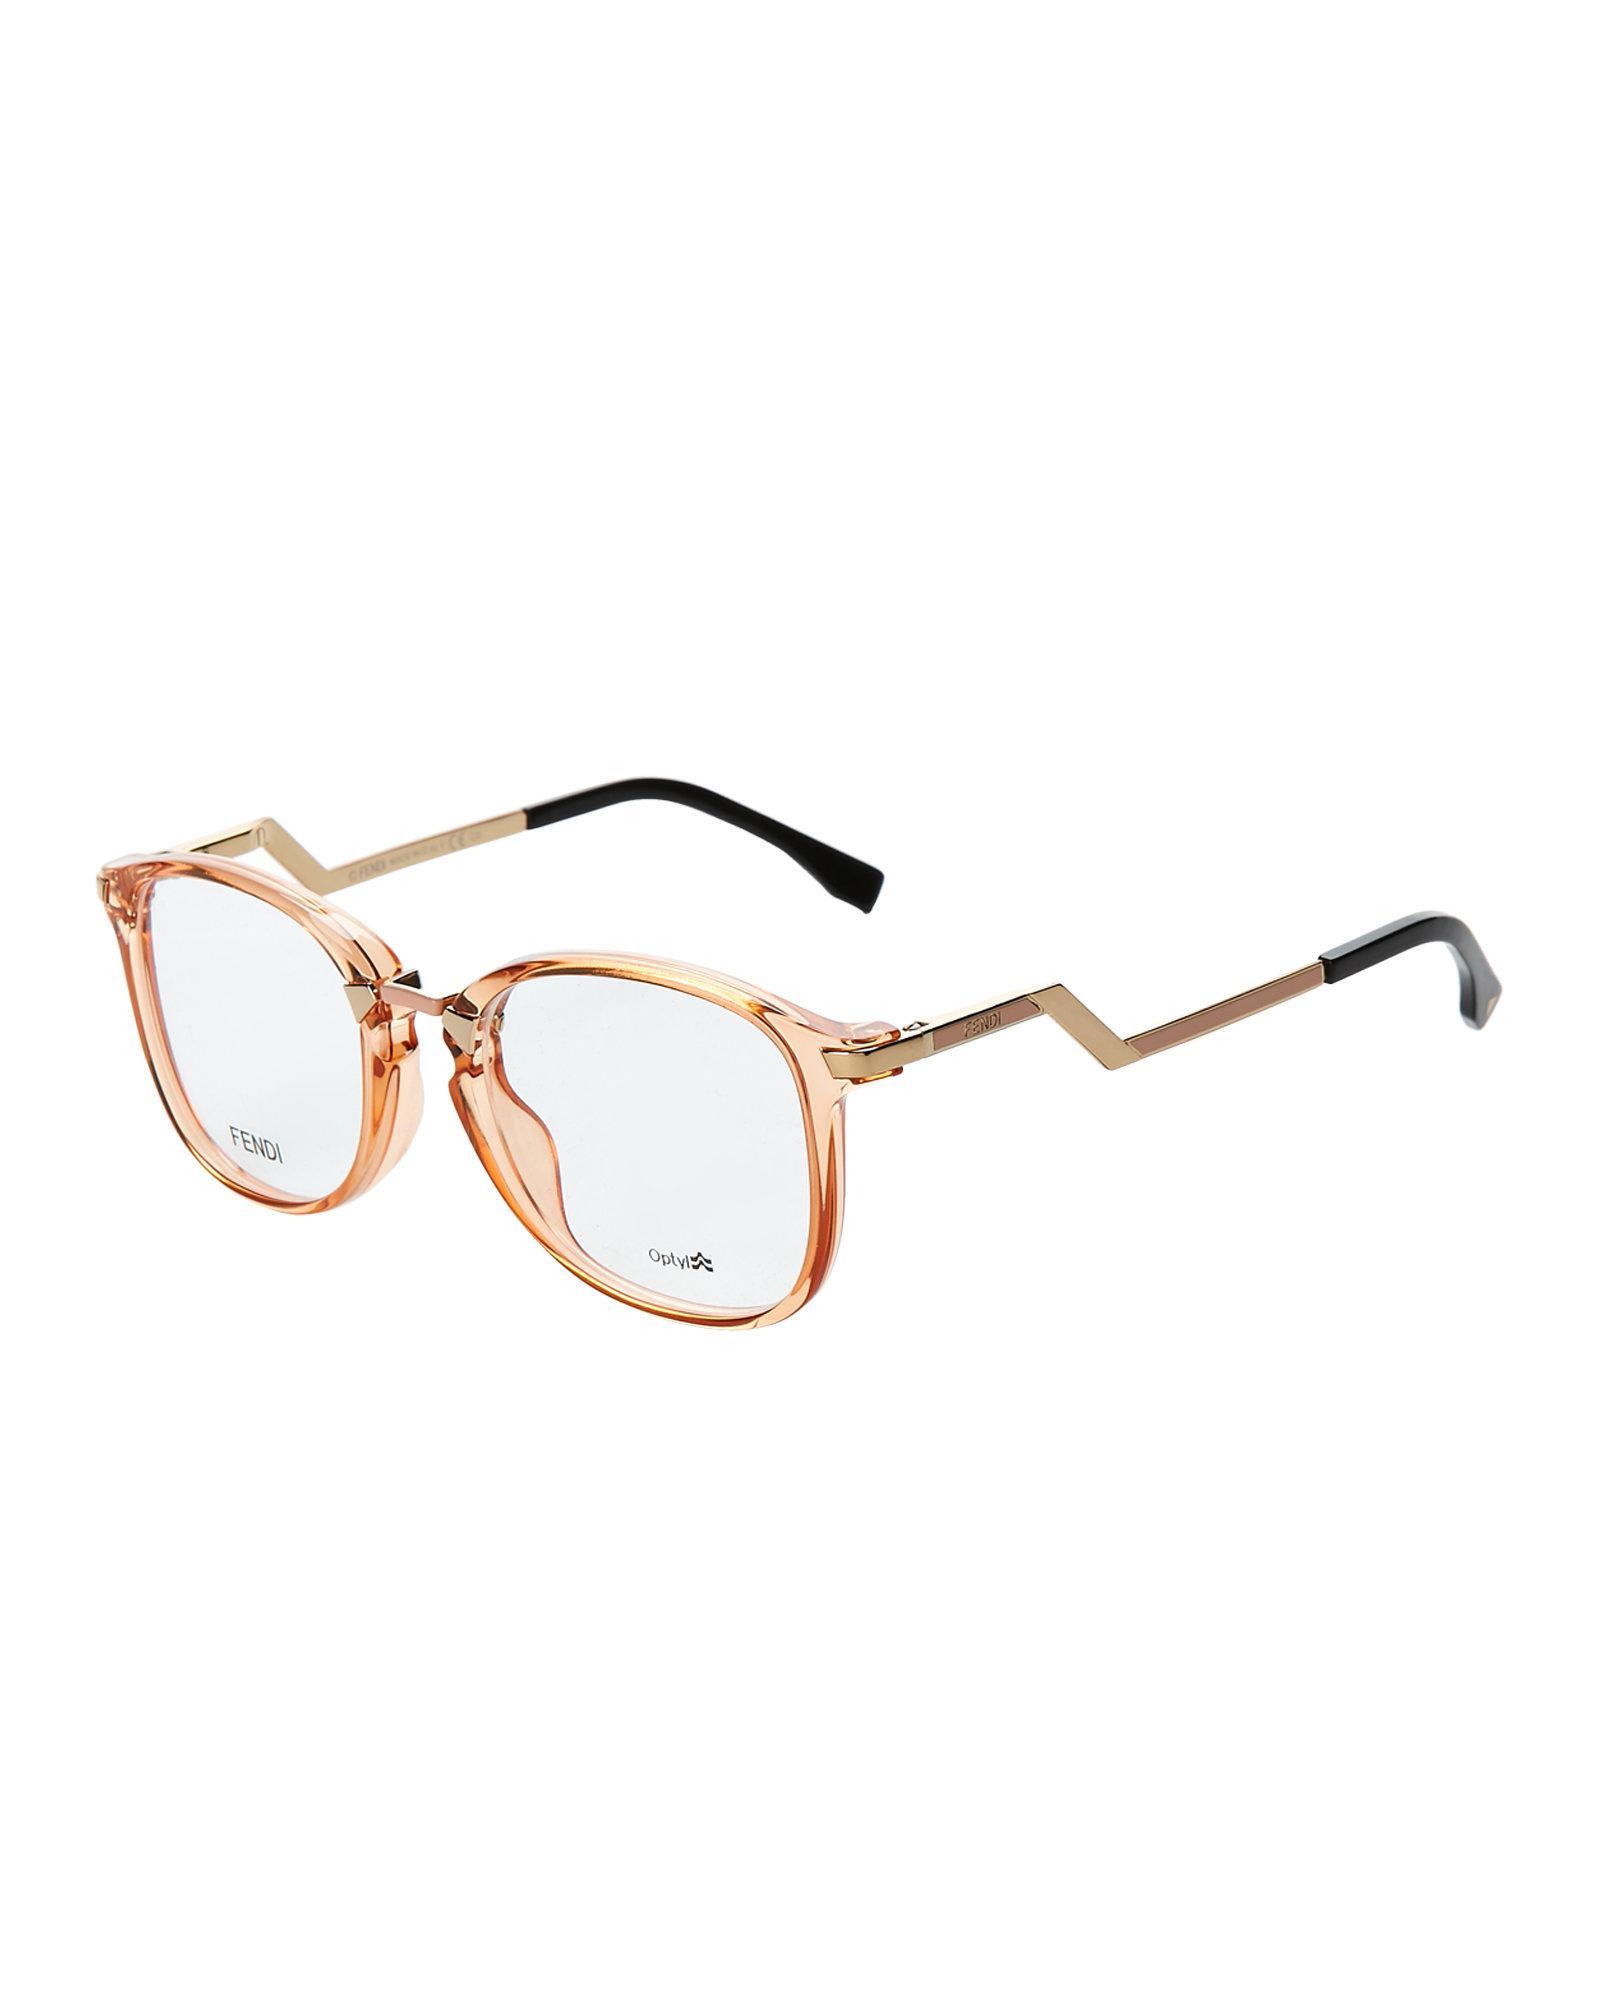 74c1f38d01a9 Lyst fendi peach square optical frames in brown jpg 1600x2000 Fendi frames  peach